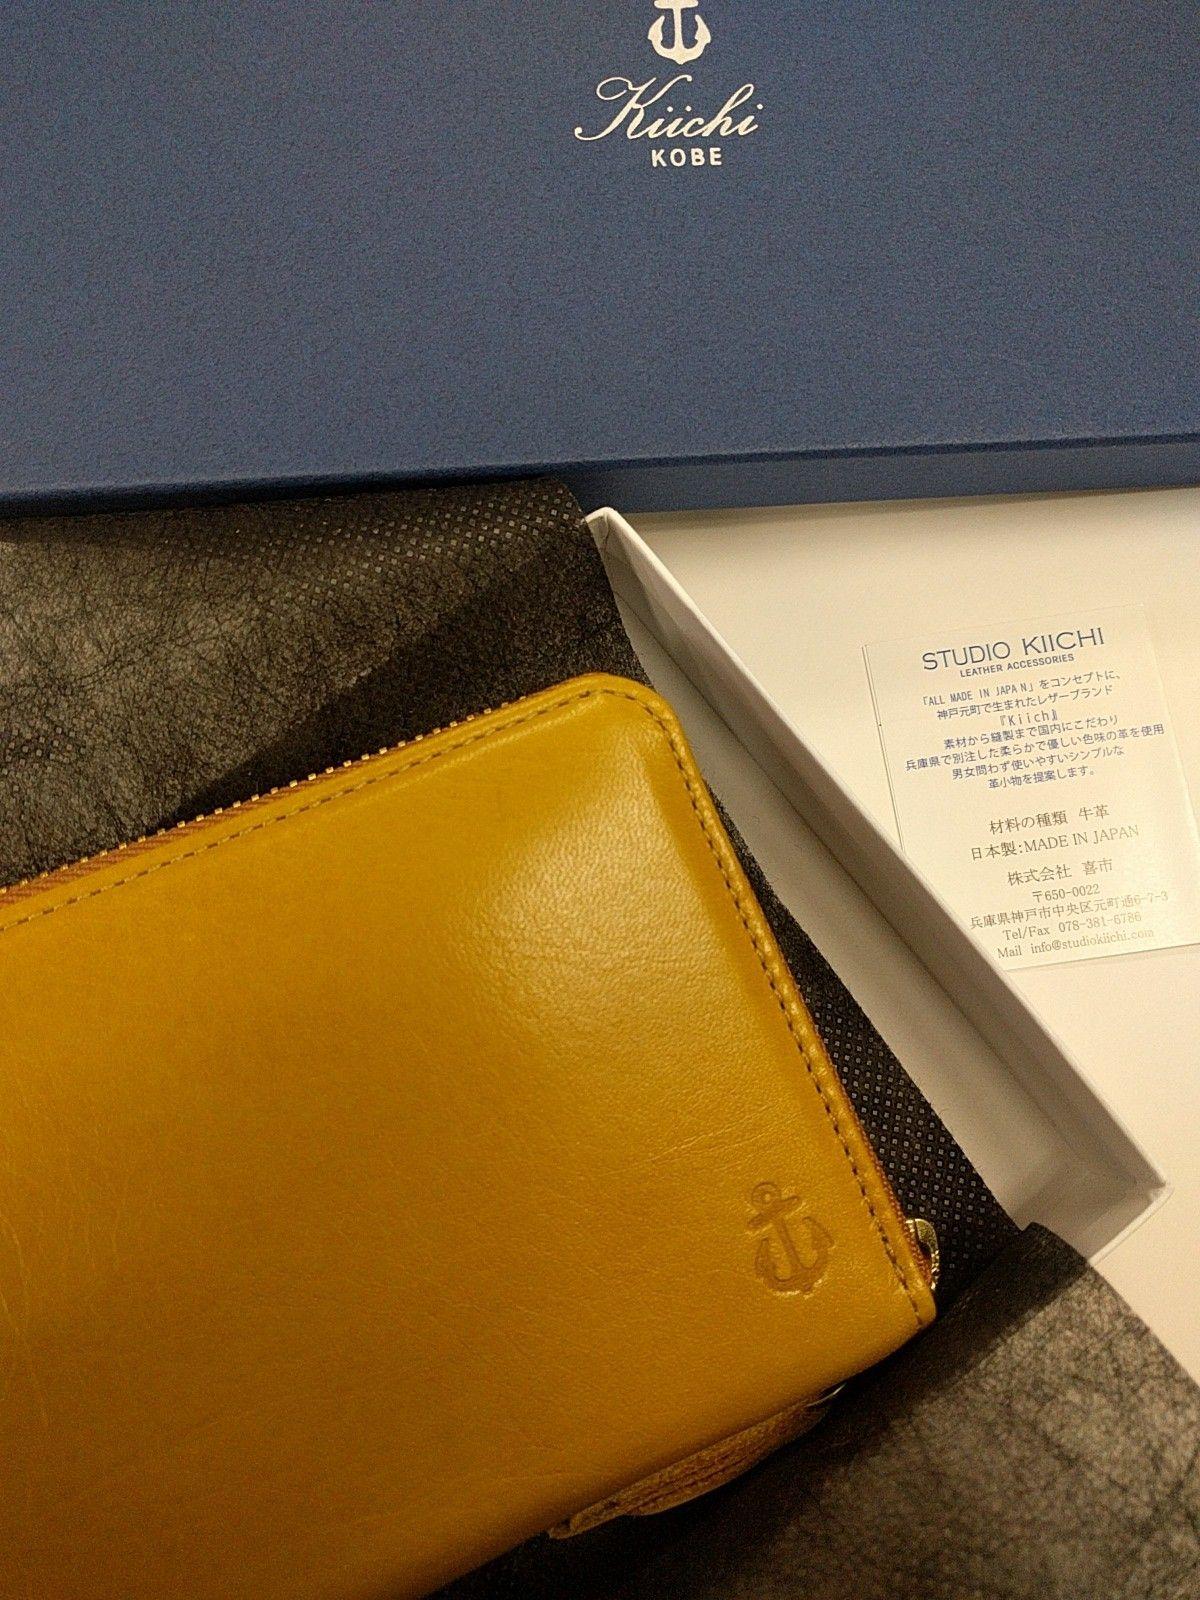 bee1986b5980b 革がくたっとなめらか!神戸 キイチ(喜市)のお財布 日本製 メイドインジャパン